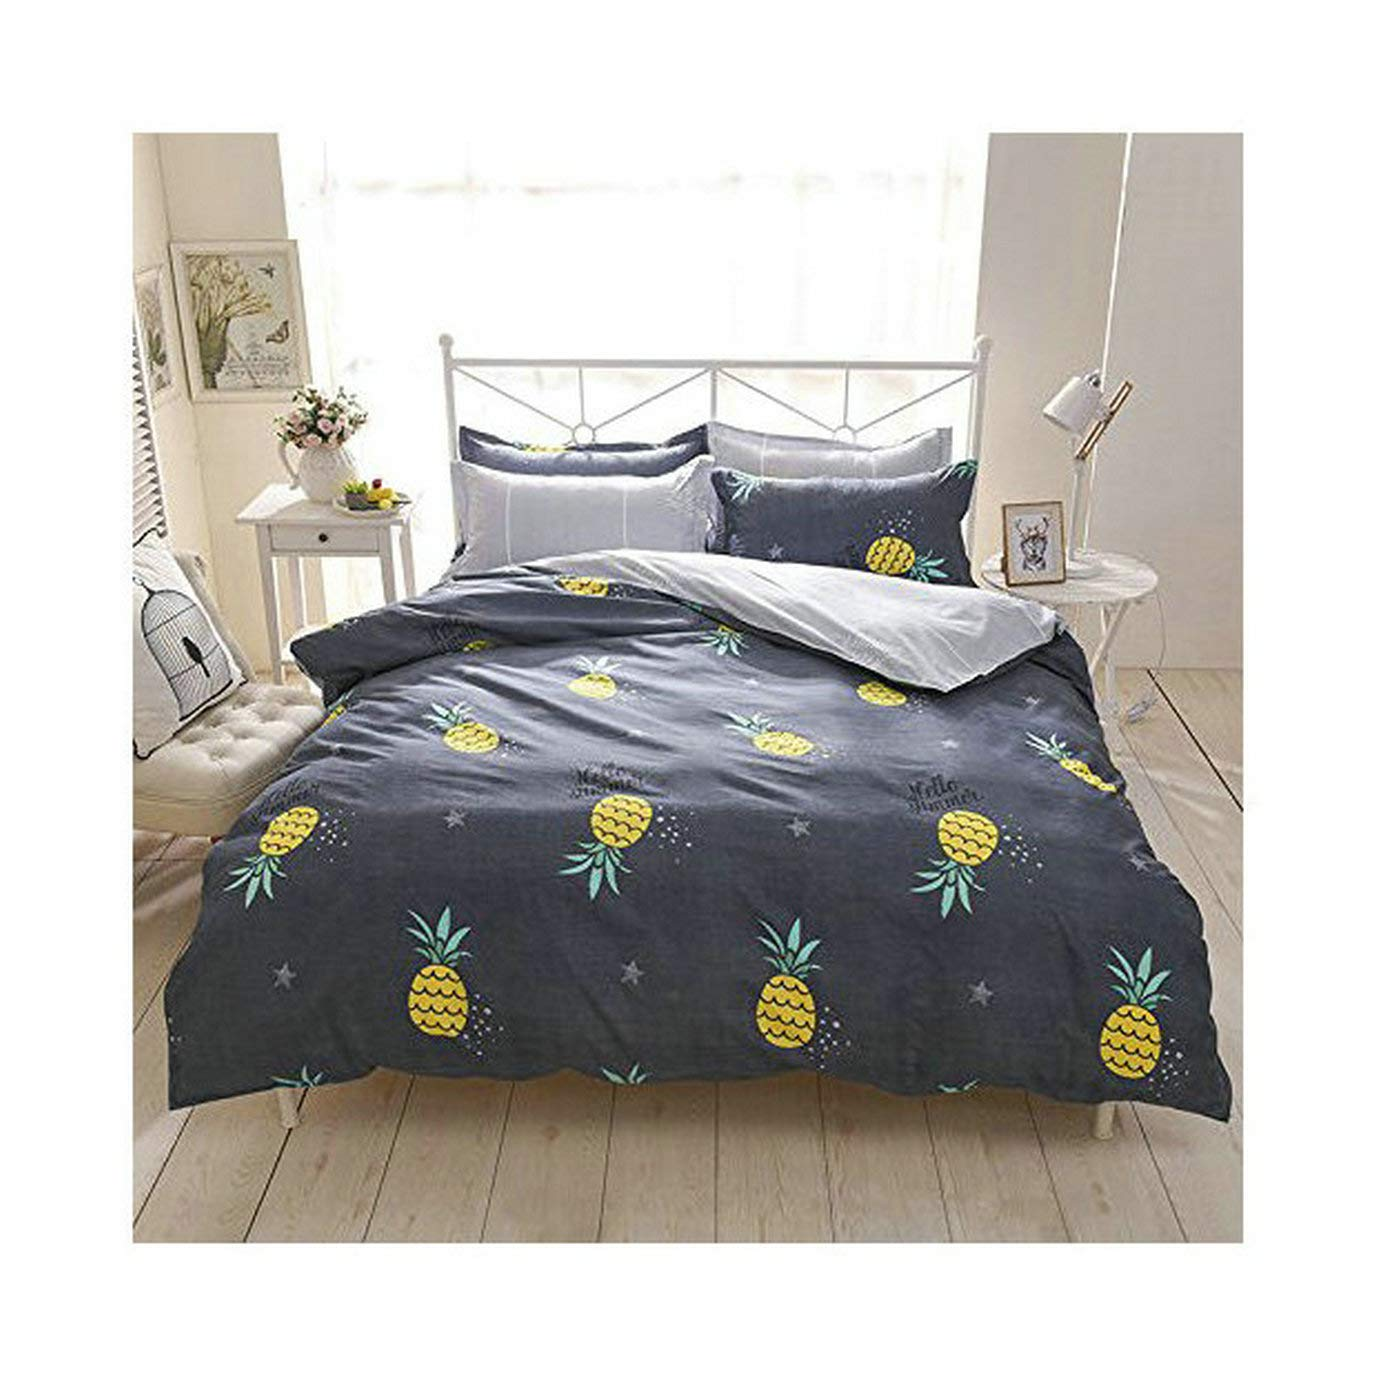 4pcs Beddingset Duvet Cover Set Without Comforter One Duvet Cover One Flatsheet Two Pillowcase KY Twin Full Queen Fruit Pineapple Banana Design (Twin 60